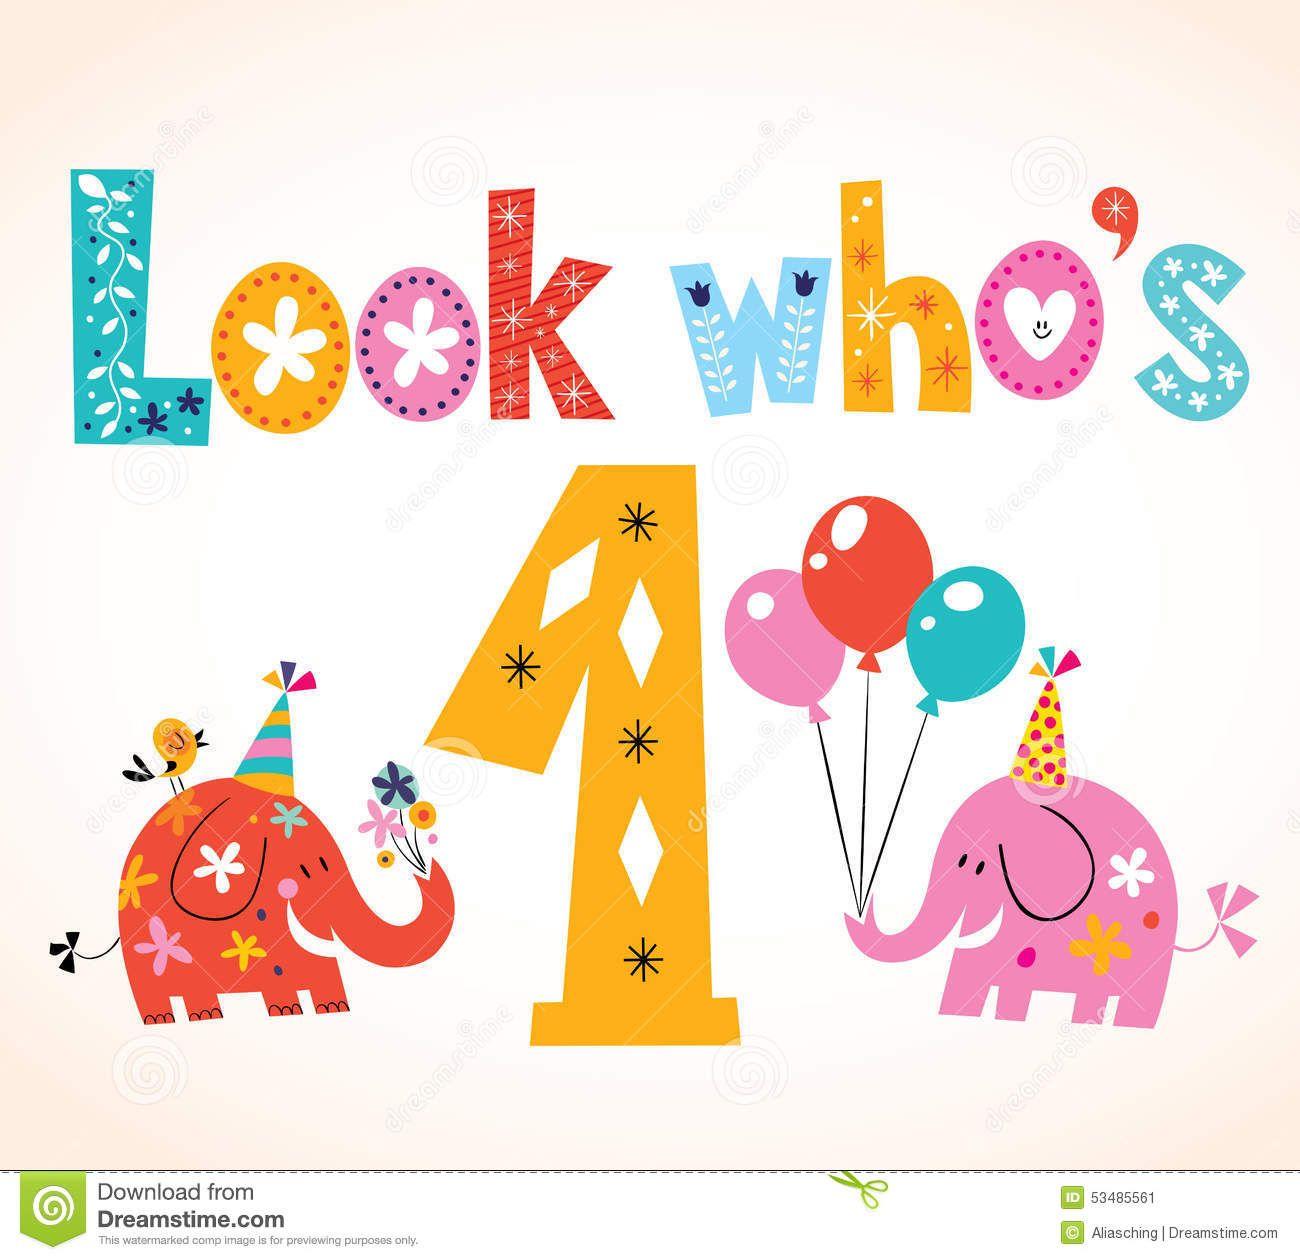 stockvectorlookwhosonefirstbirthdaycardq1EPHwclipartjpg – Happy 1st Birthday Card